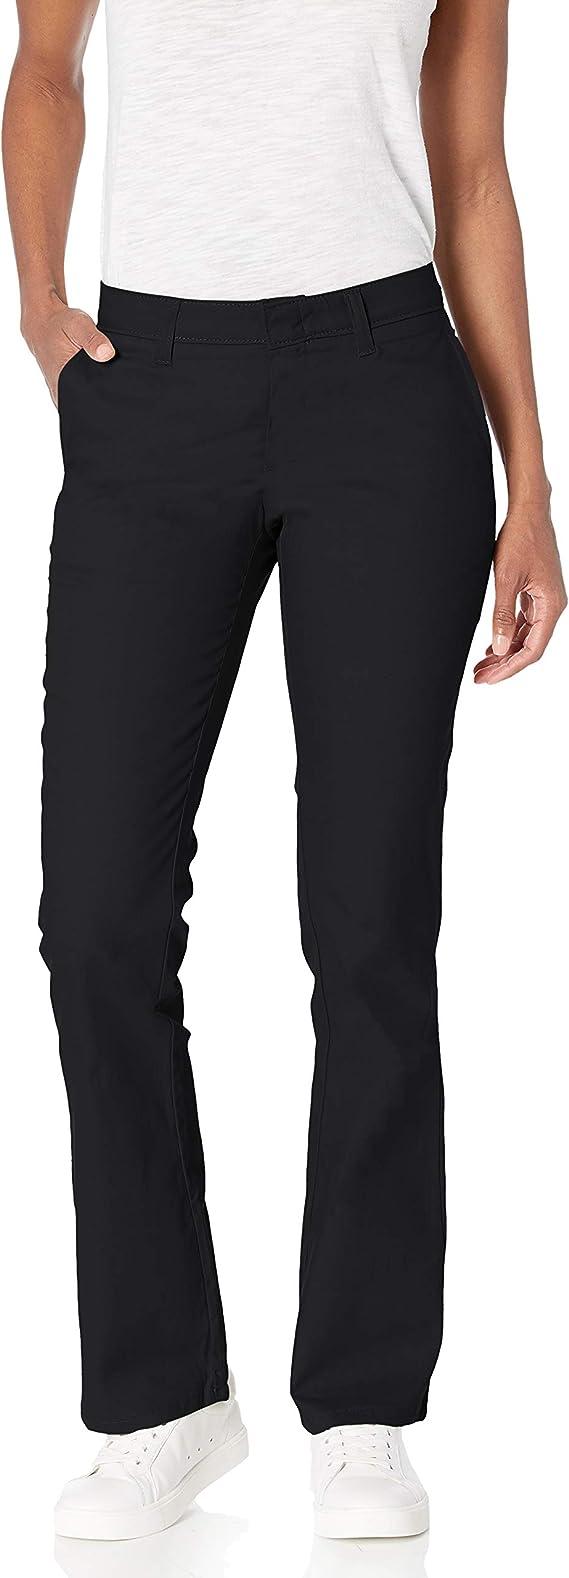 Dickies Pantalón Stretch para Mujer: Amazon.com.mx: Ropa ...